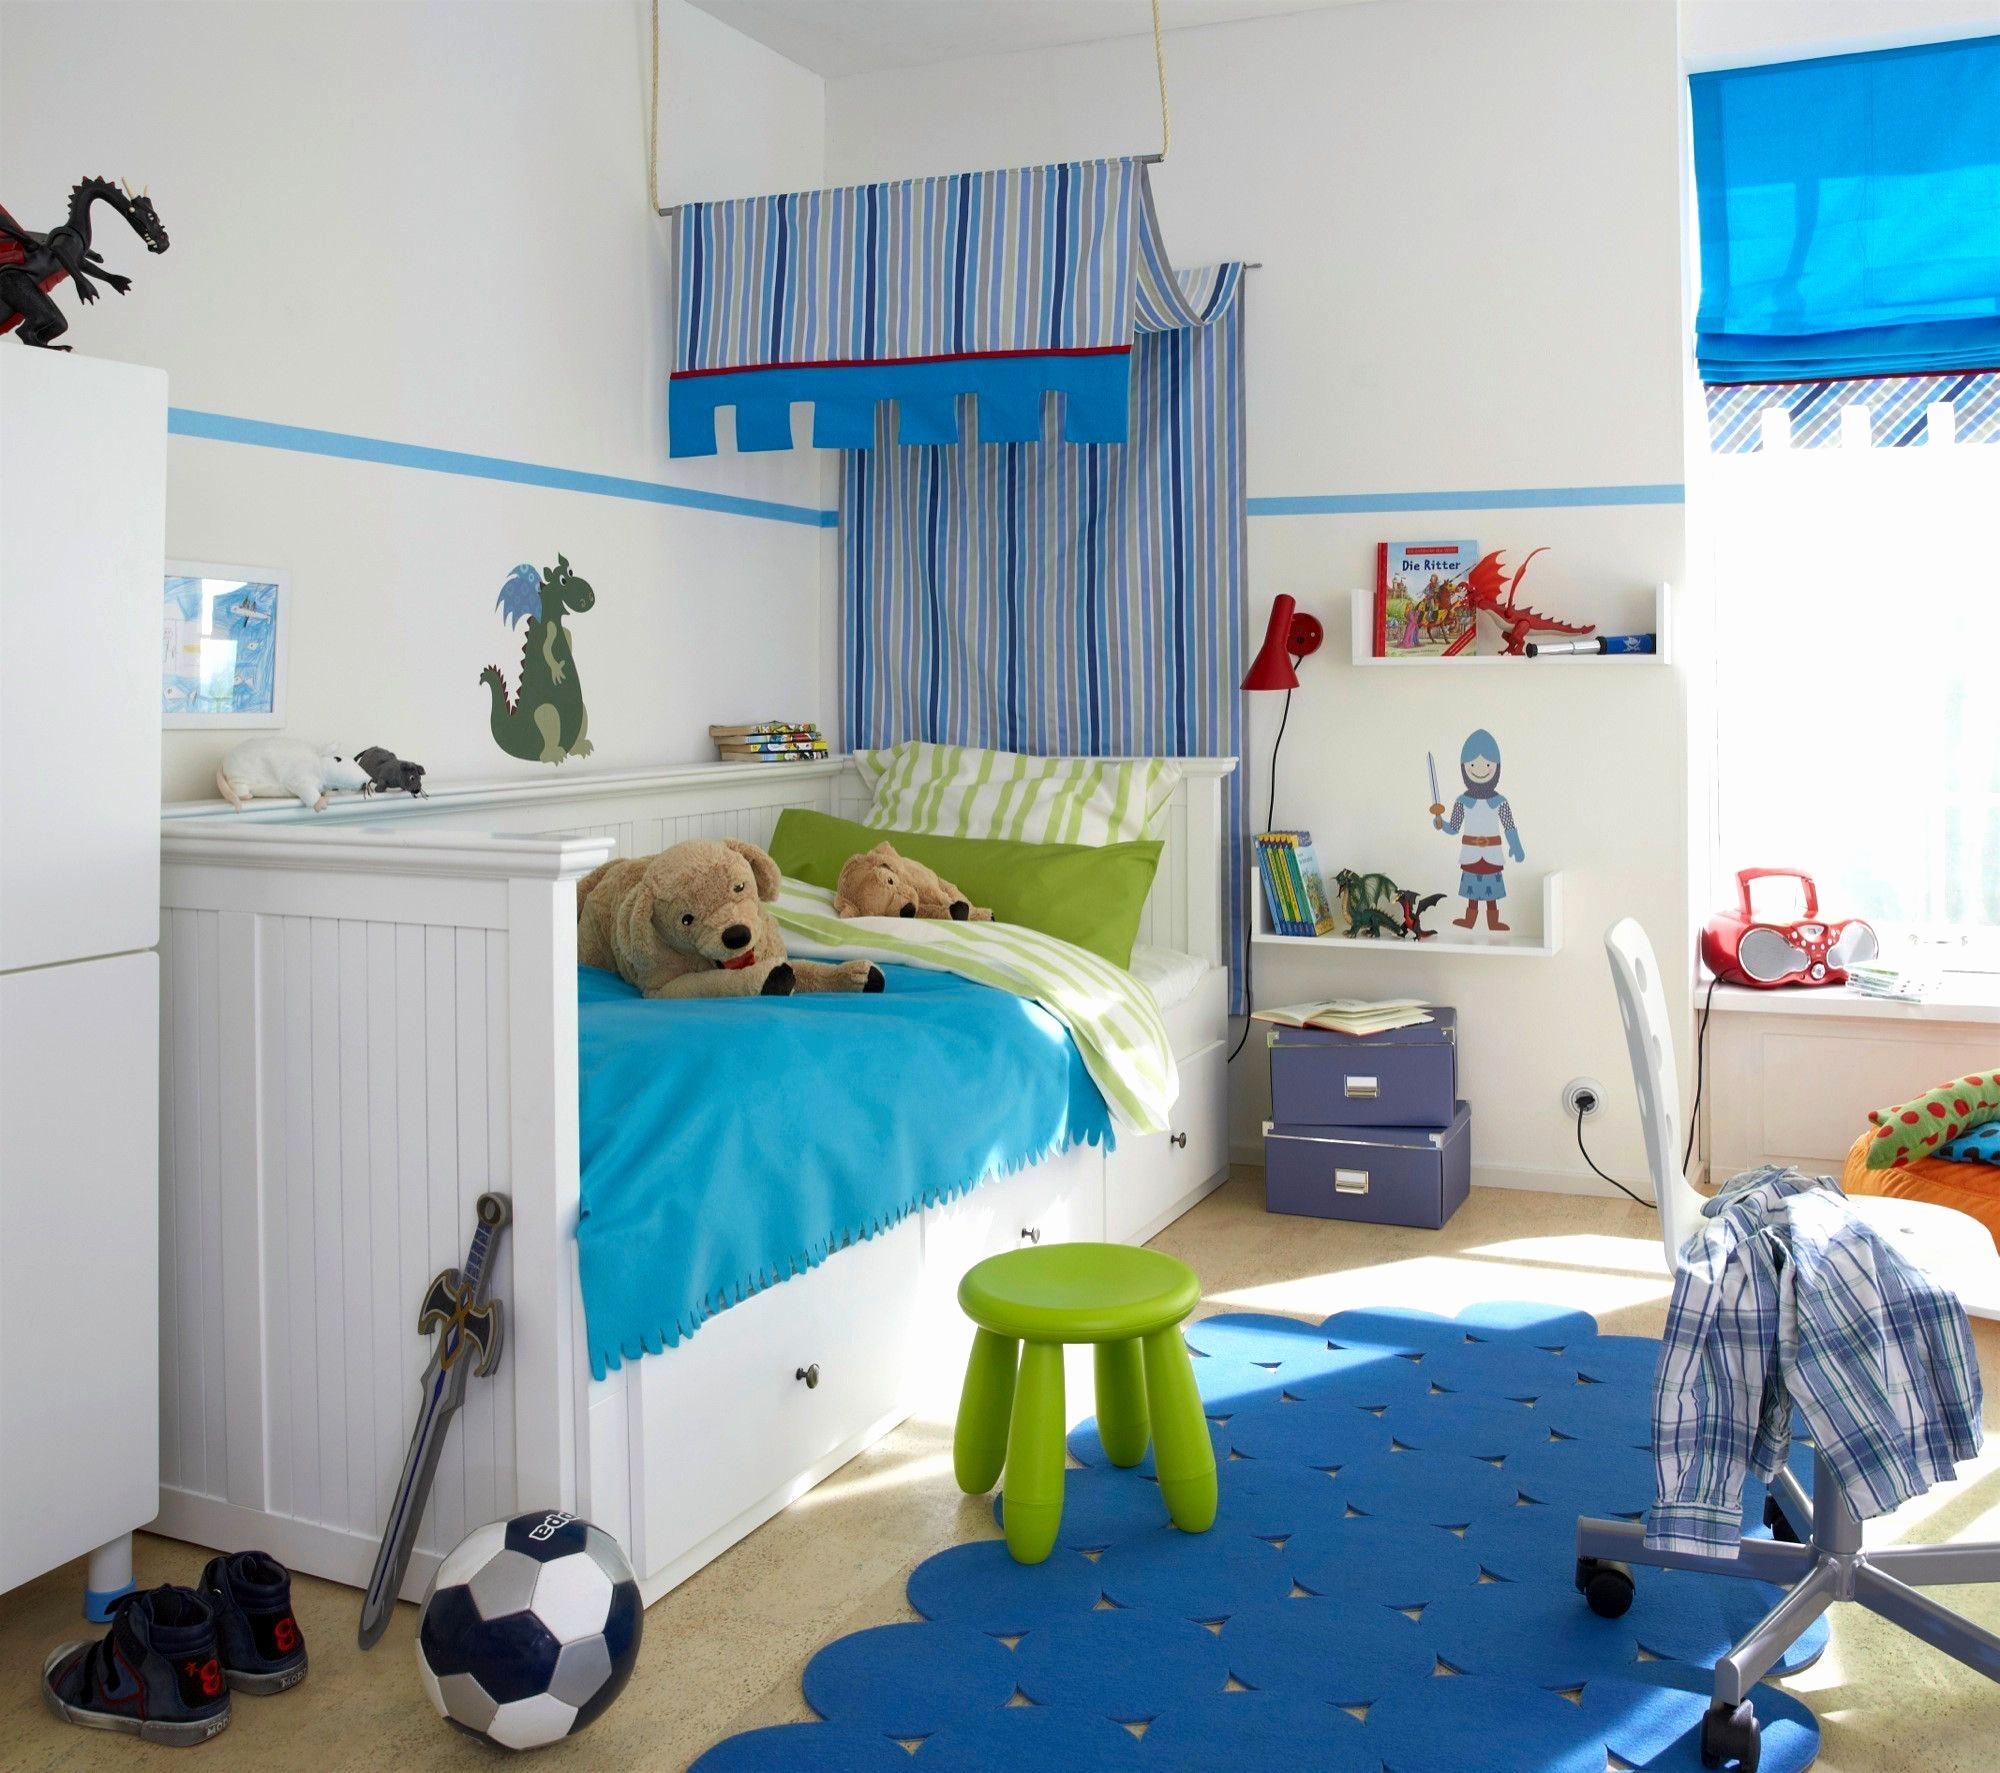 wandgestaltung selber malen inspirierend wandgestaltung babyzimmer selber machen genial frisch kinderzimmer of wandgestaltung selber malen